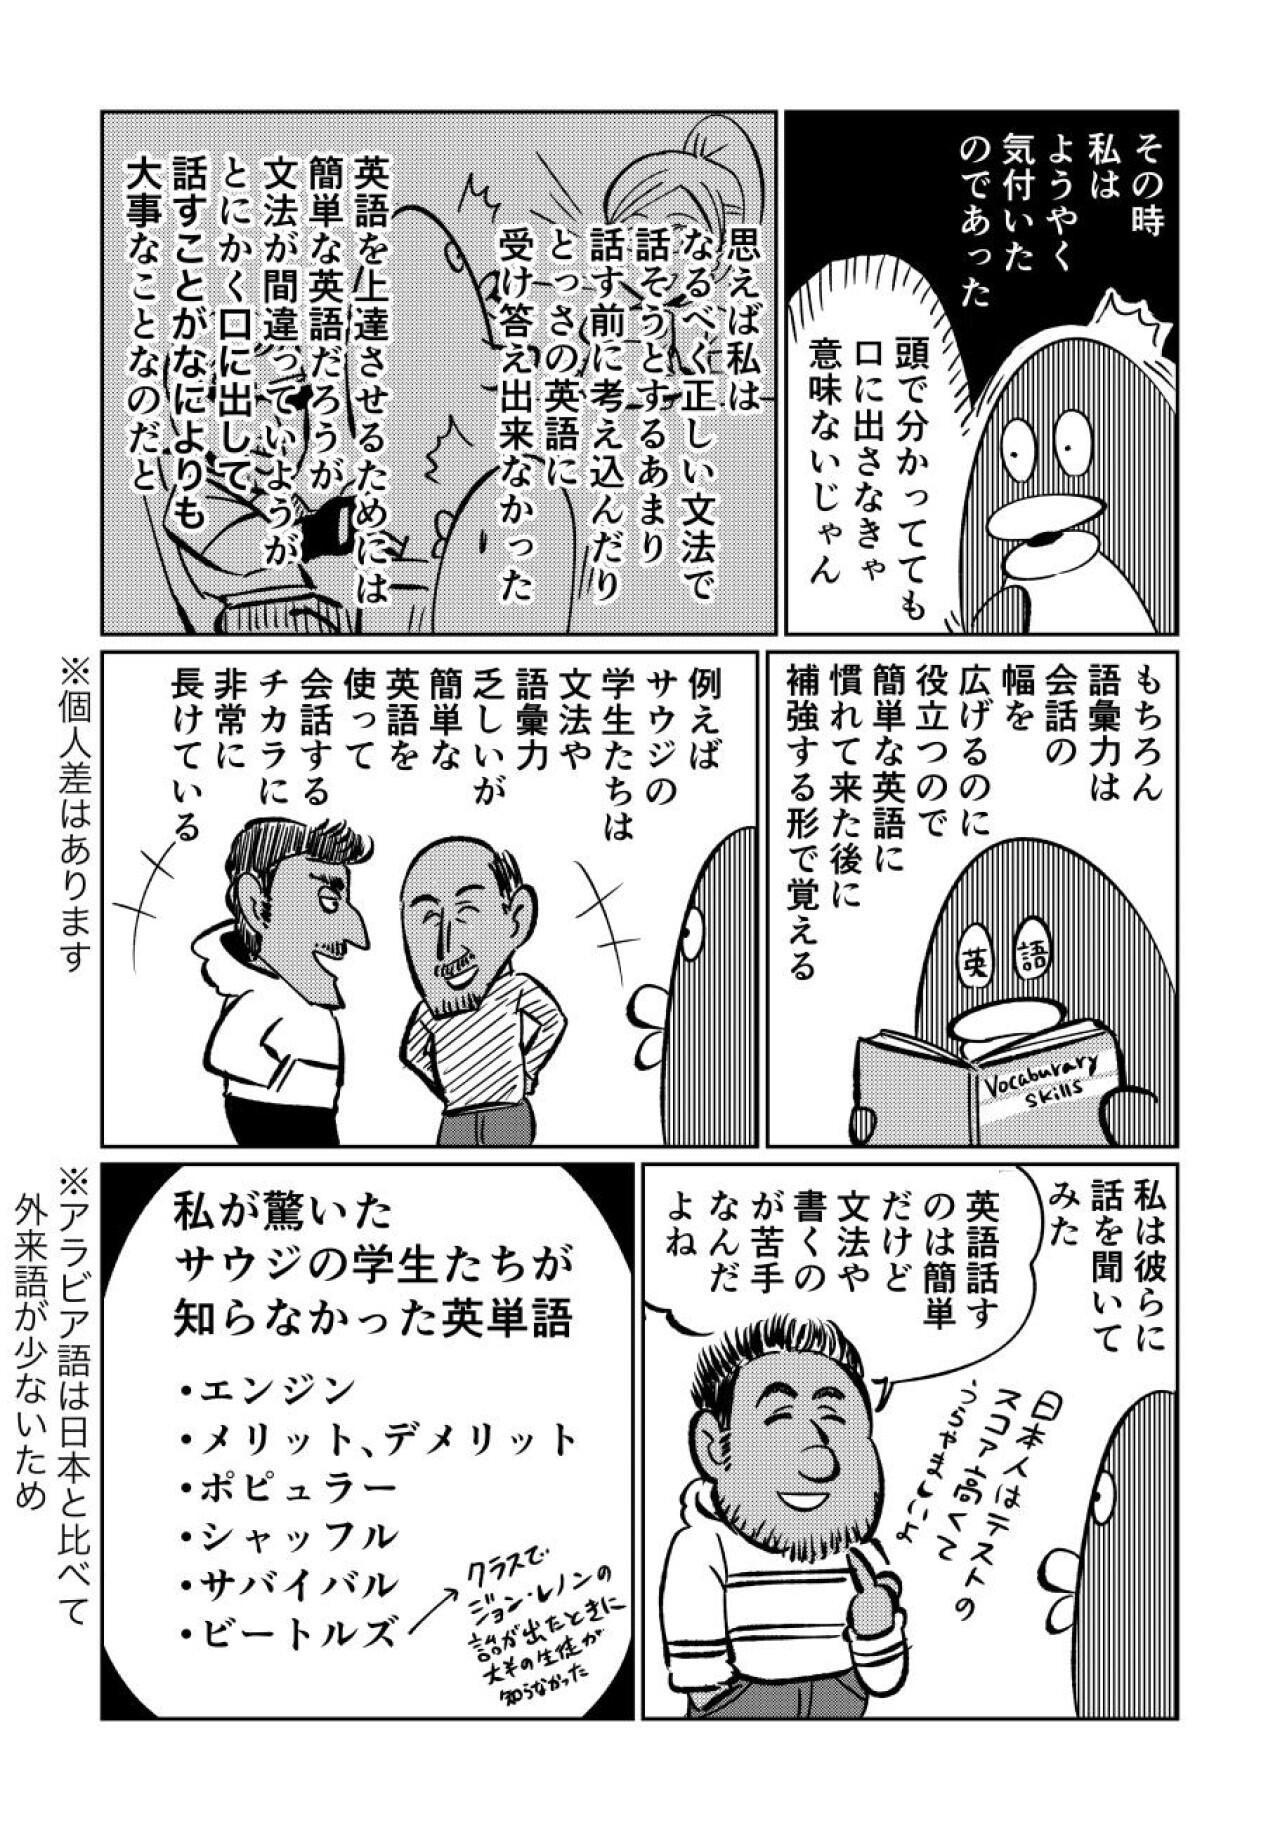 https://www.ryugaku.co.jp/column/images/34sai7_3_1280.jpg